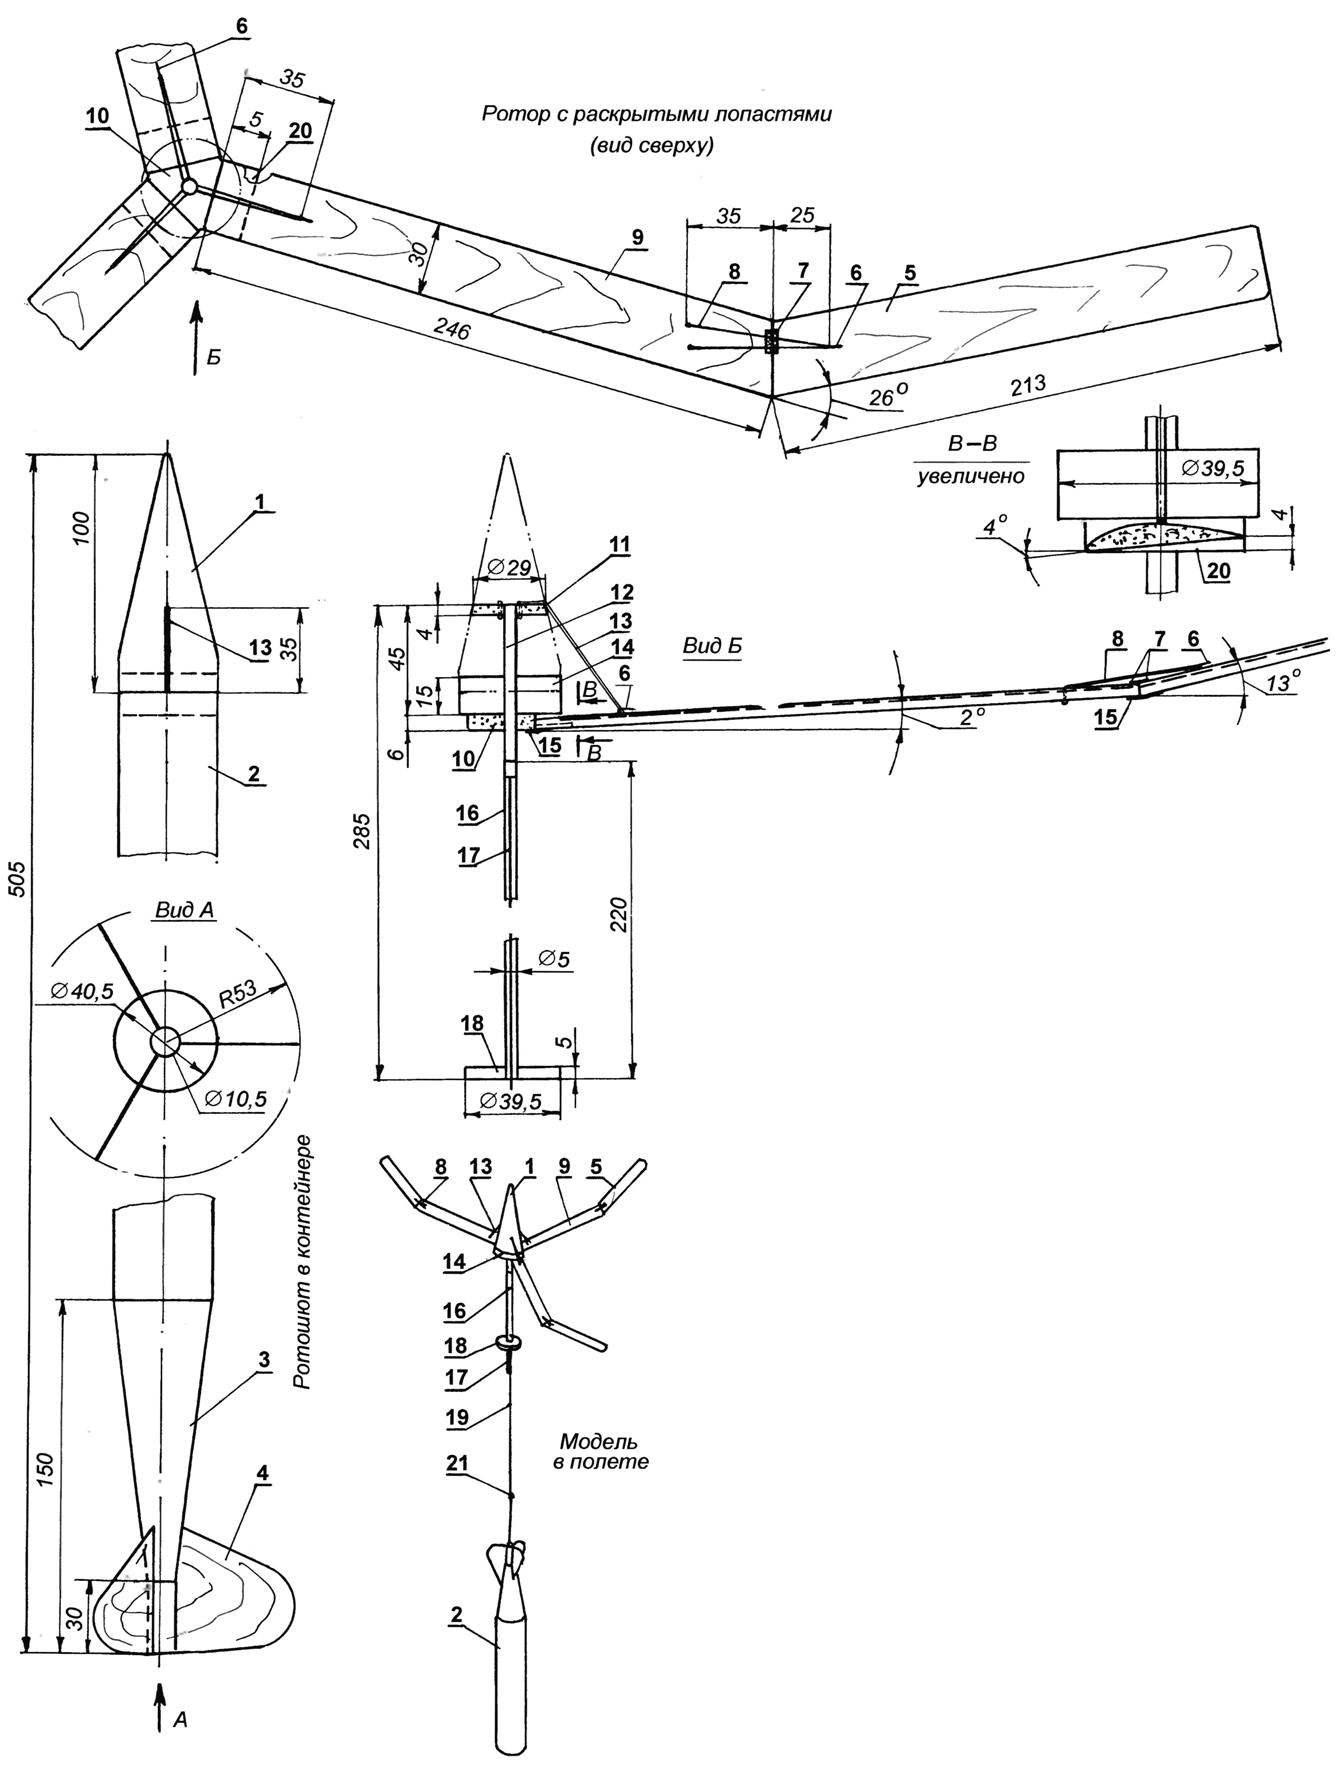 Fig. 1. Model rotocut class S9B A. gryazeva (Chelyabinsk)